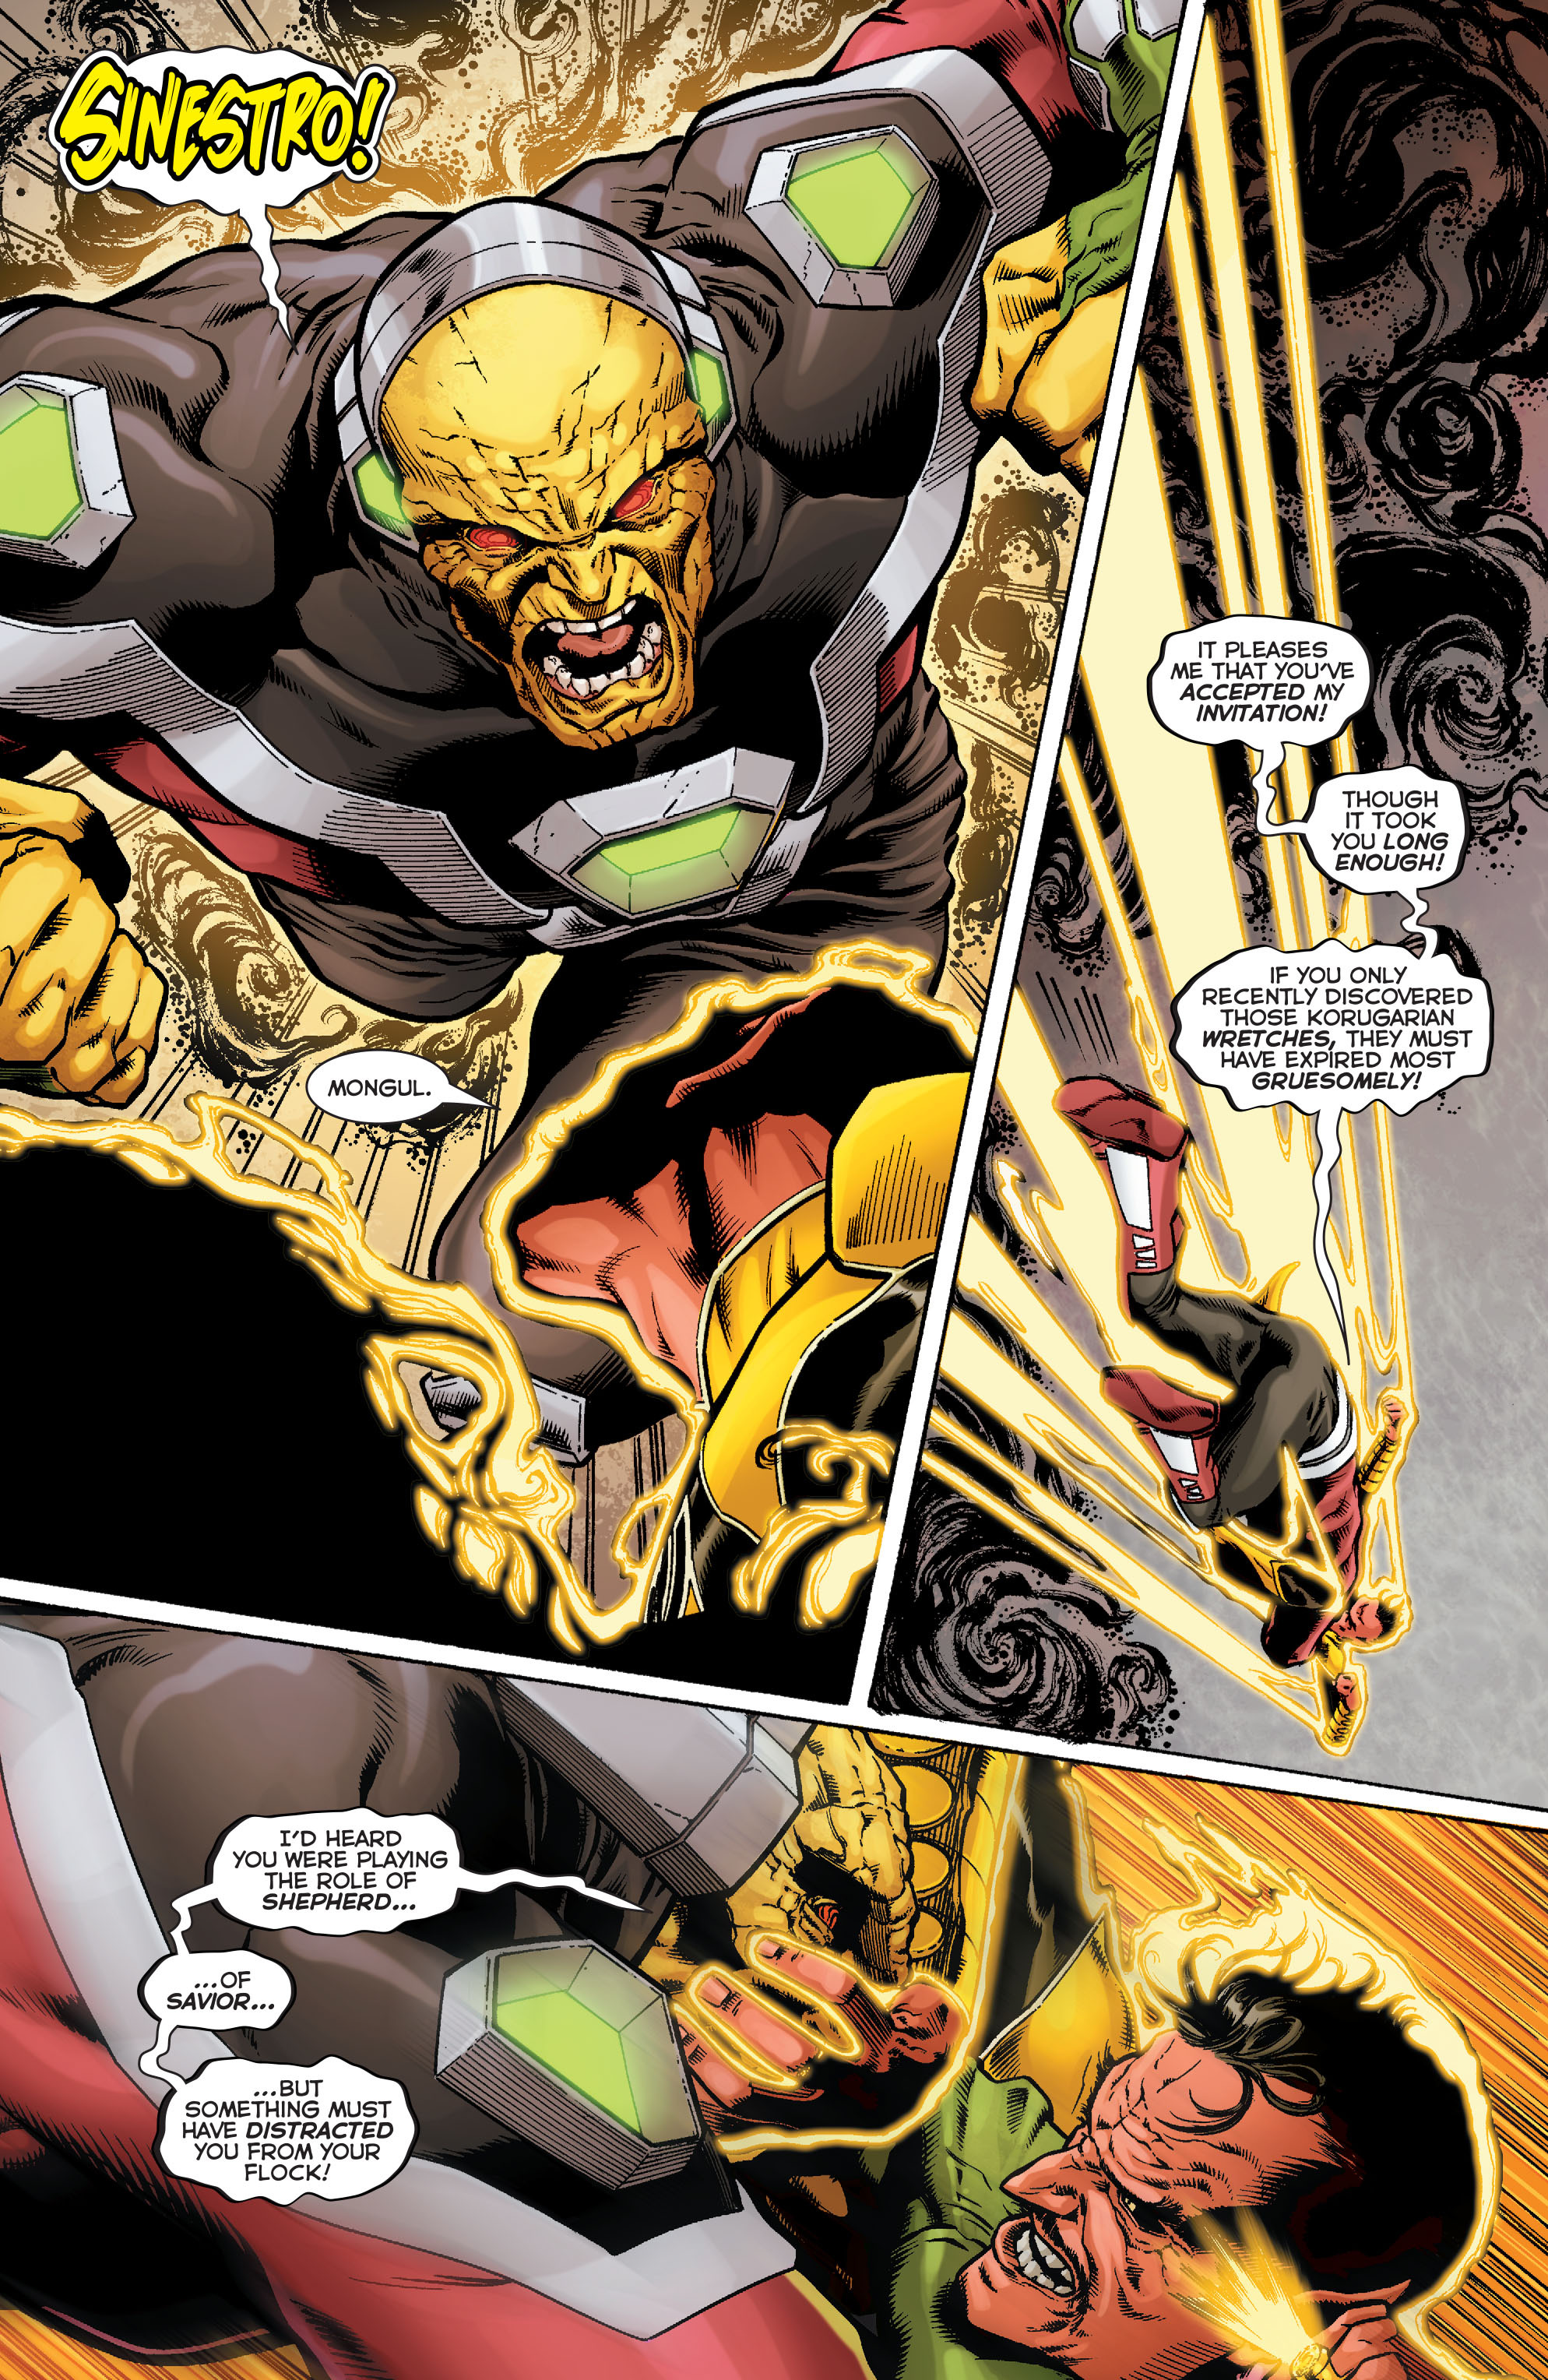 Read online Sinestro comic -  Issue #9 - 16